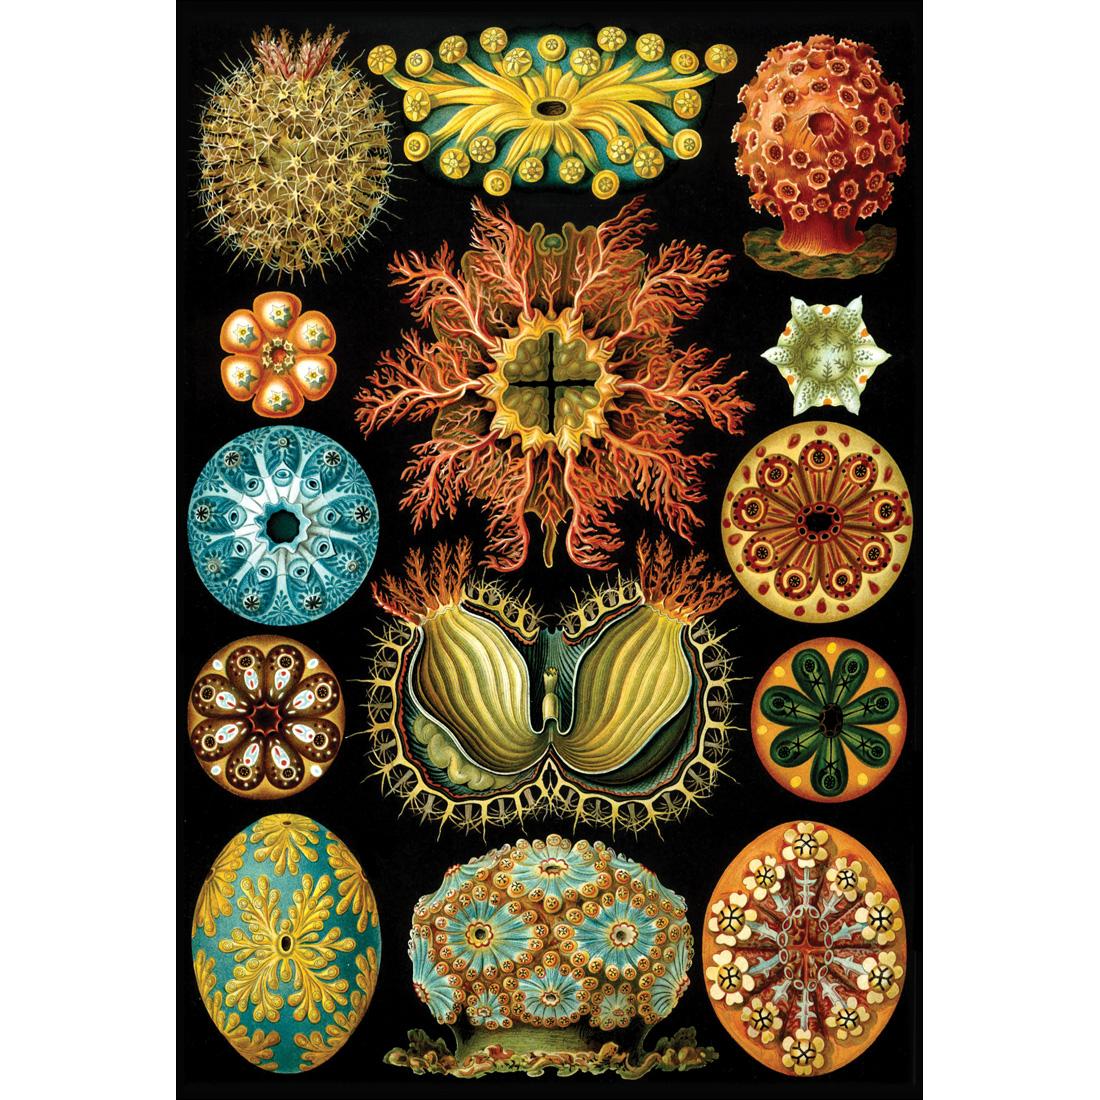 2741AR-Ernst-Haeckel-Illustration-THUMB__55457.jpg